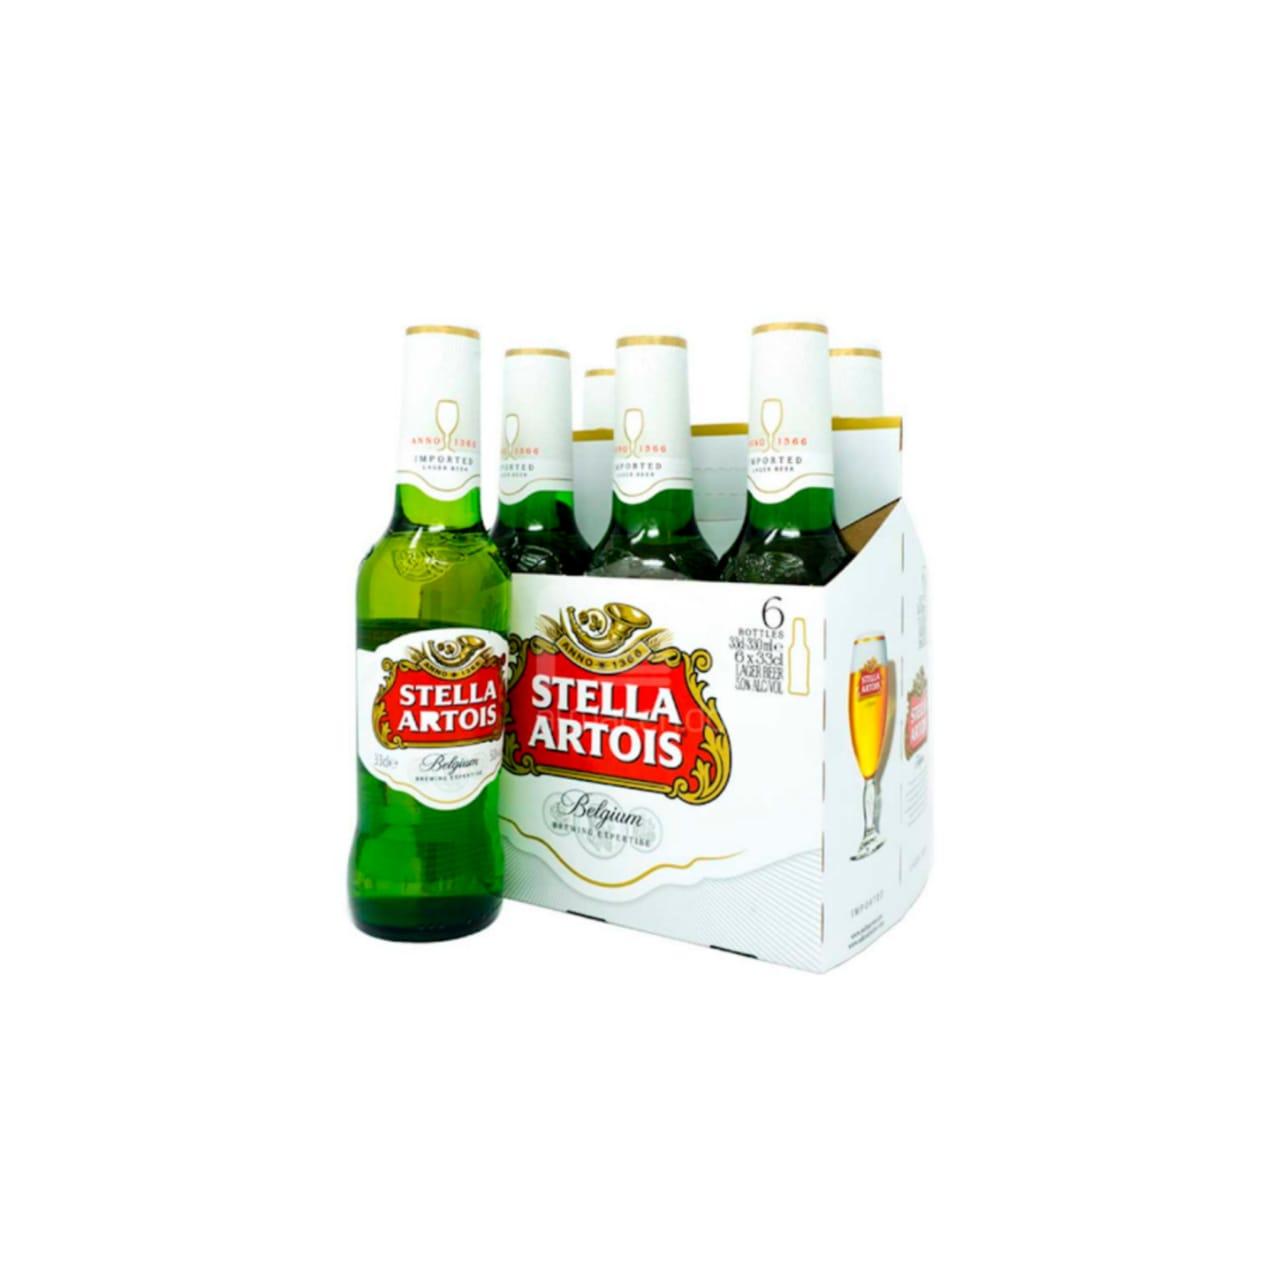 Stella Artois x 6